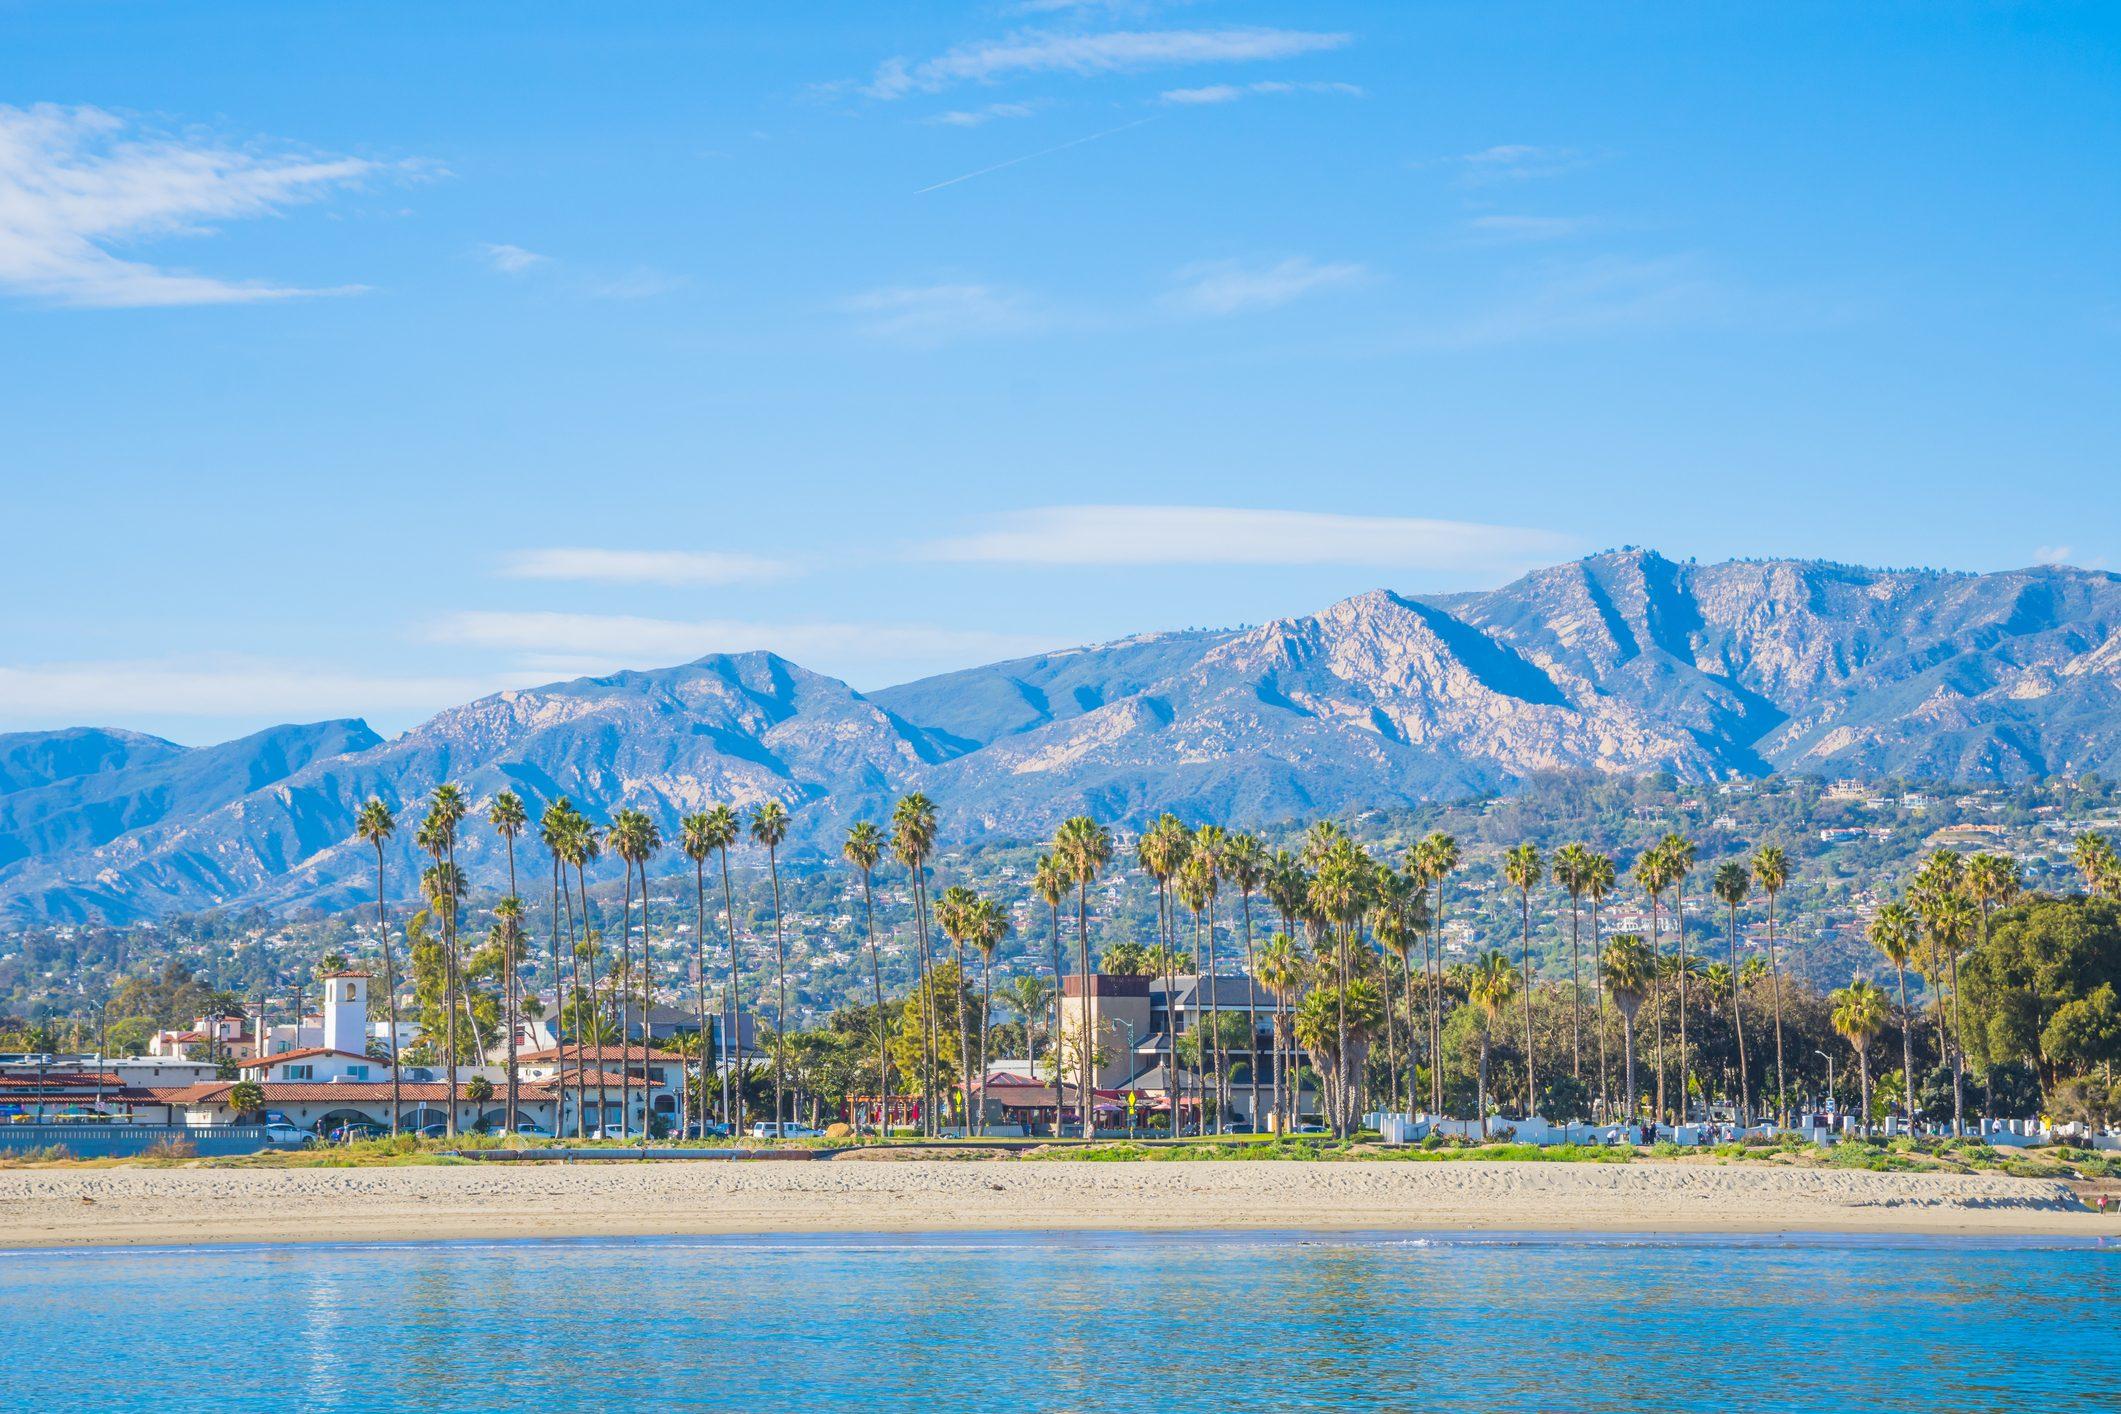 Mediterranean style of Santa Barbara, California